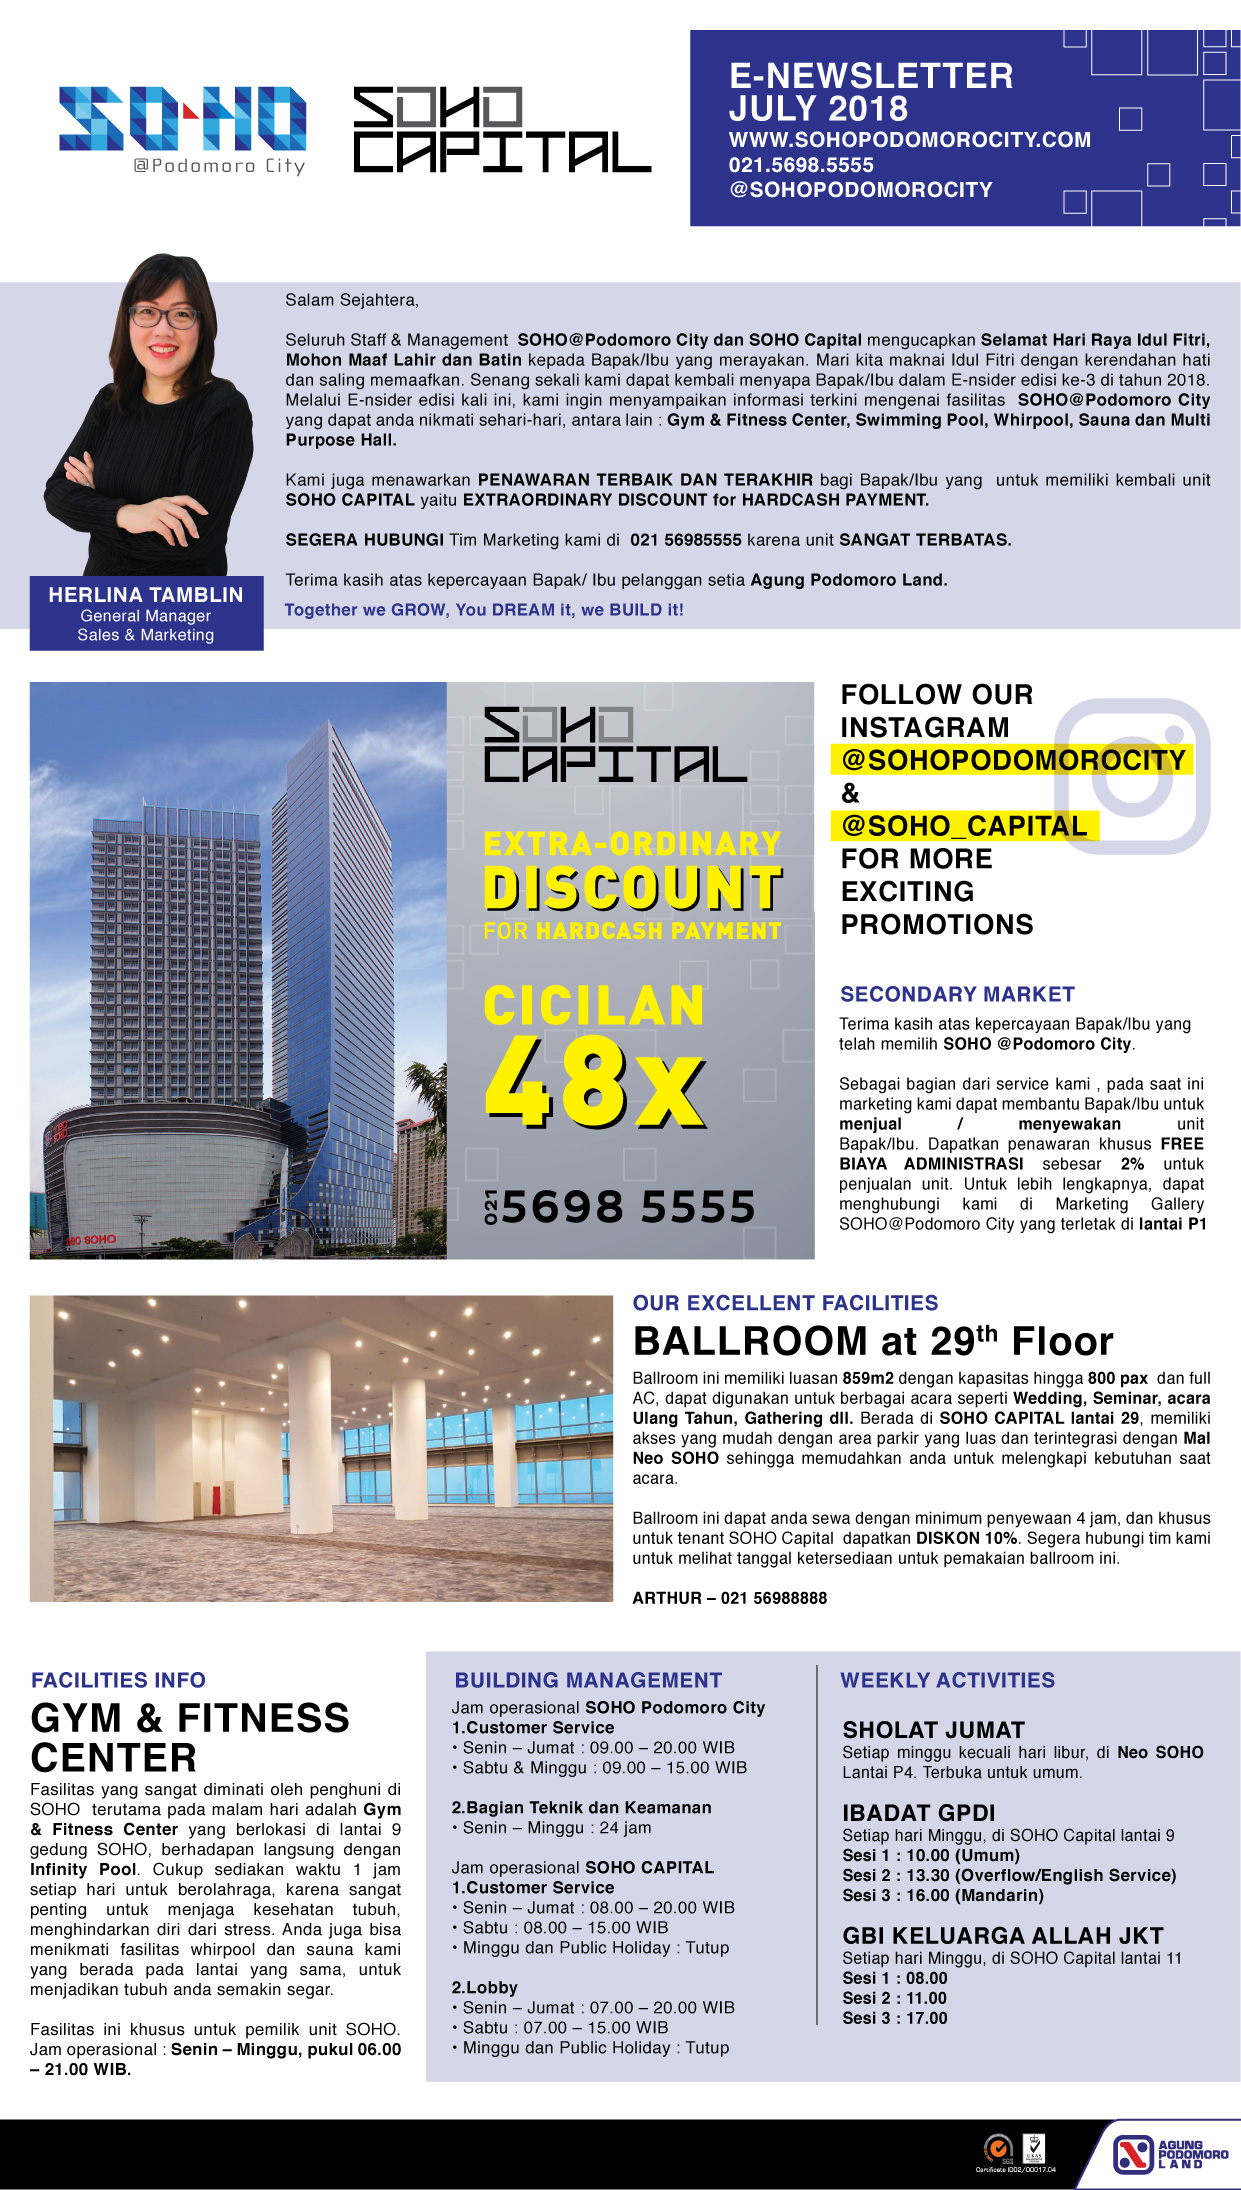 SOHO Podomoro City & SOHO Capital e-newsletter July-September 2018